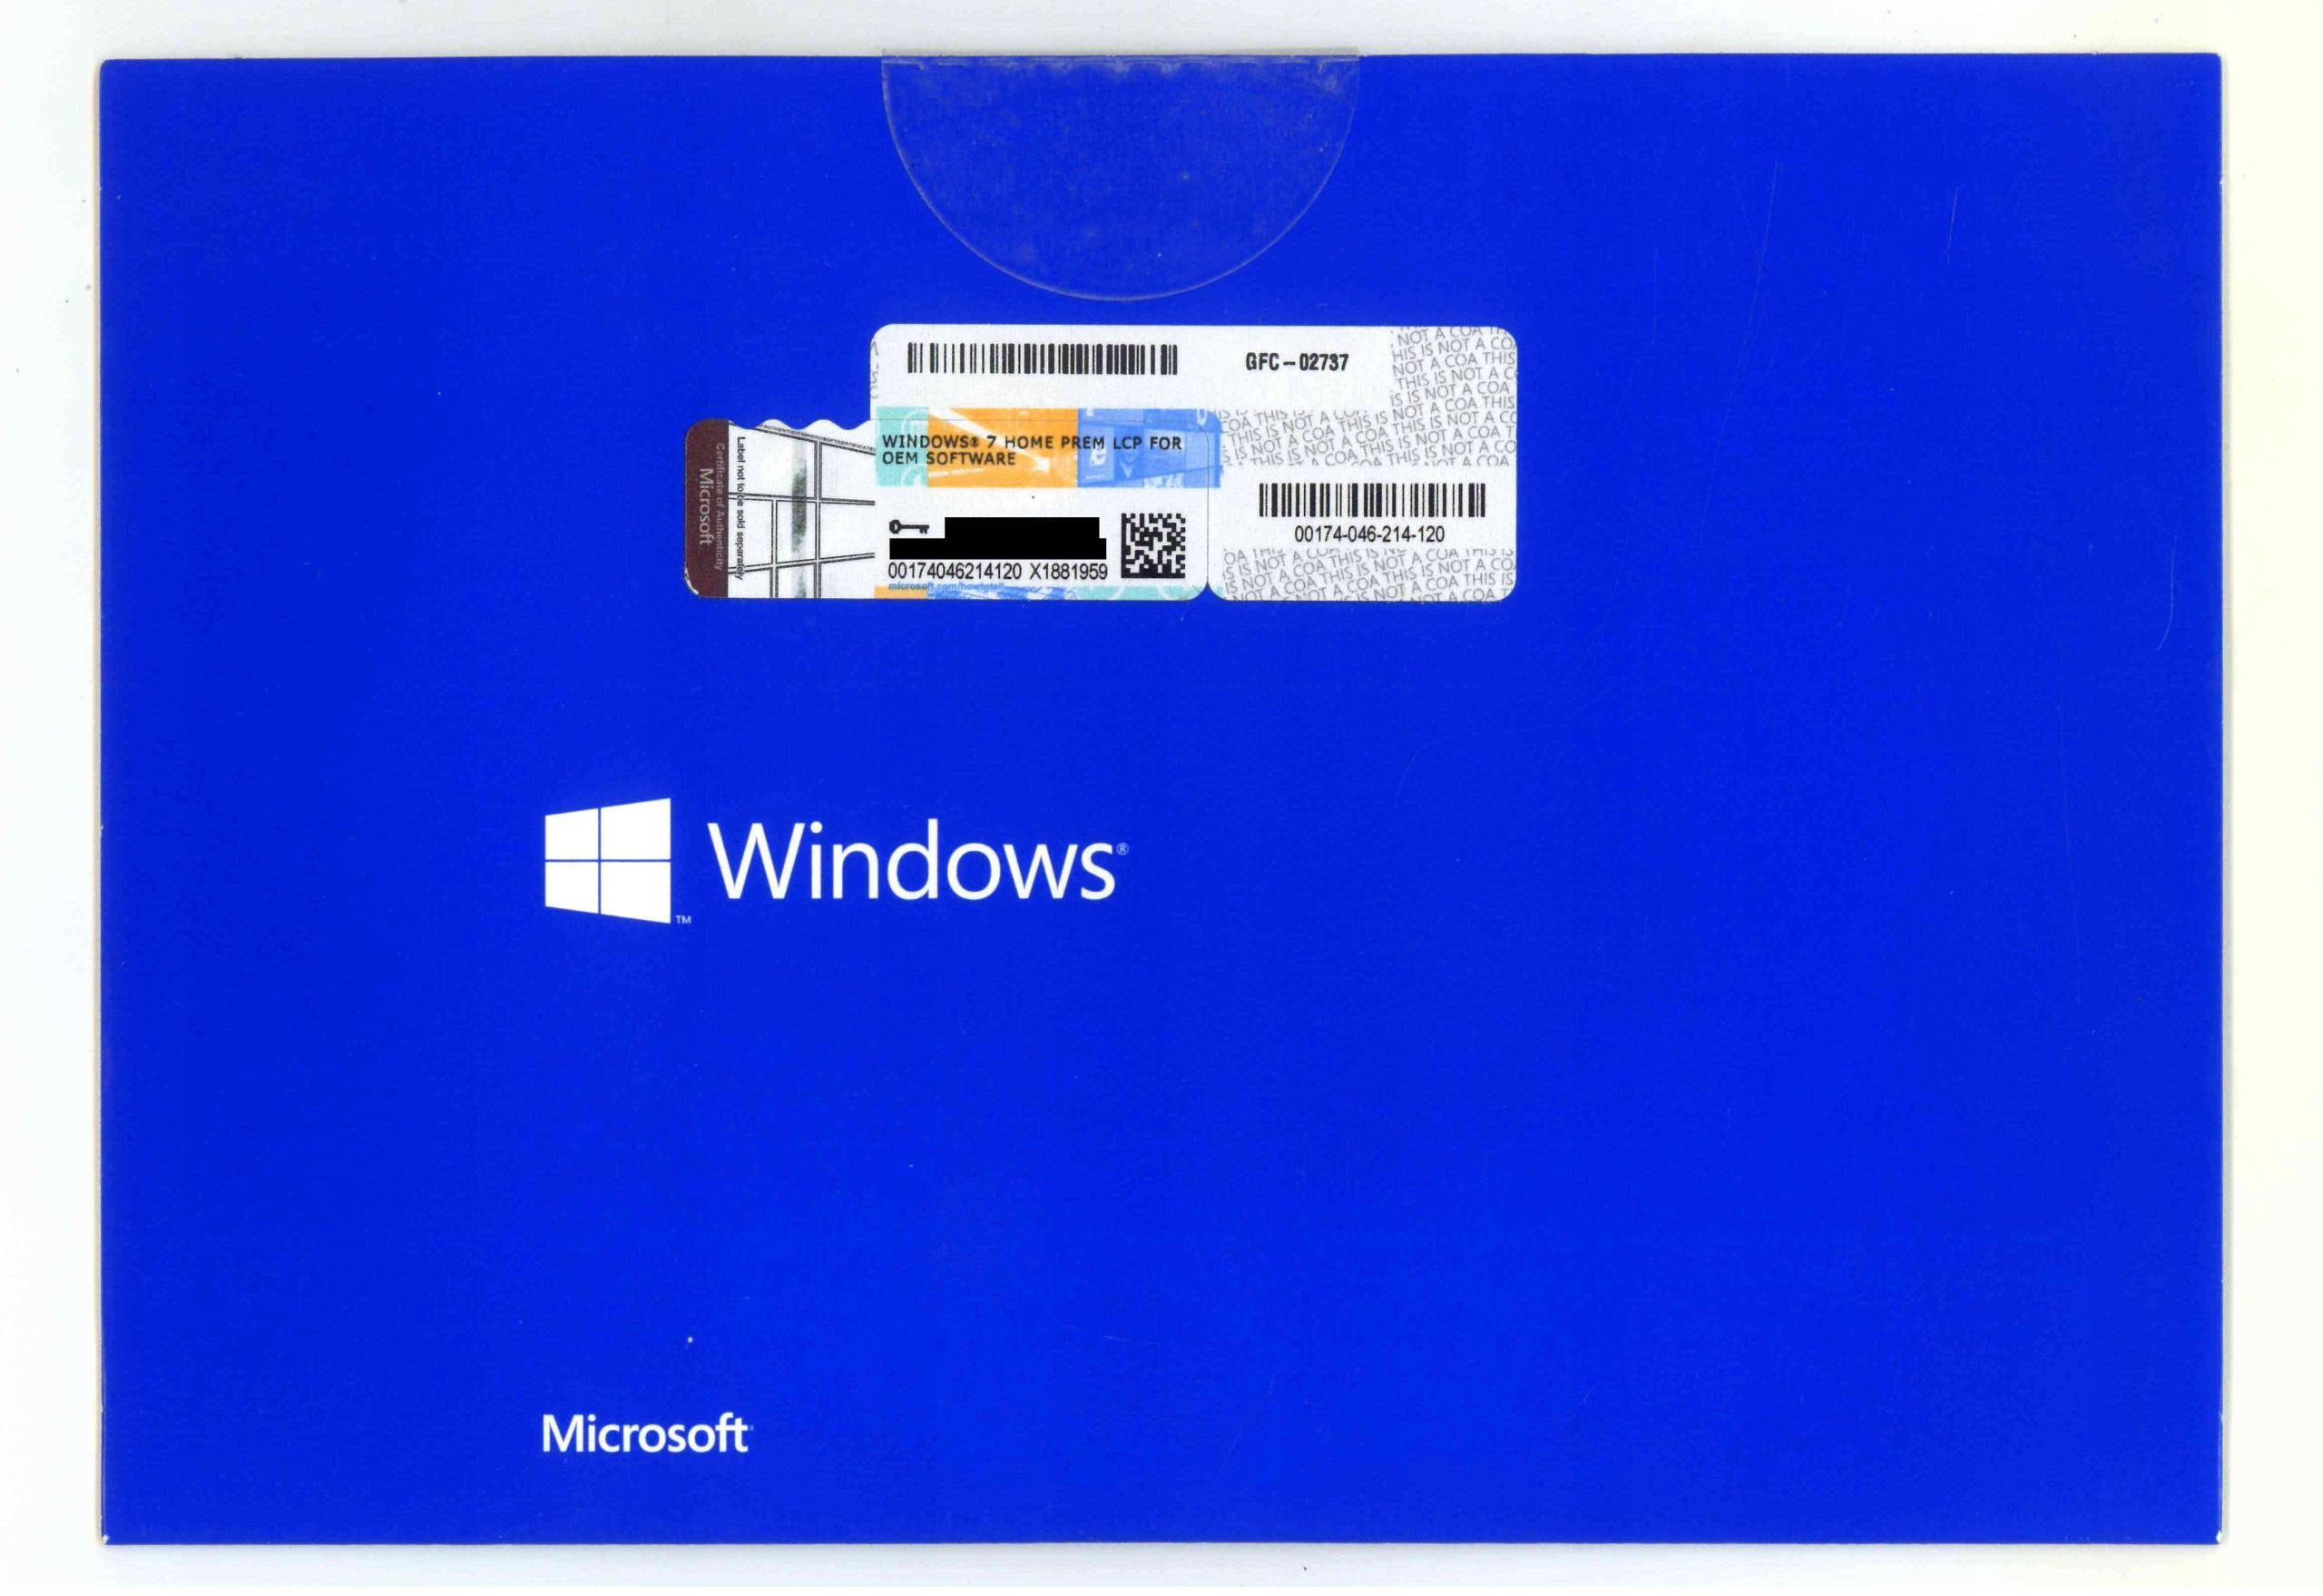 OKAZJA! WINDOWS 7 Home Premium PL 64-bit NÓWKA!!